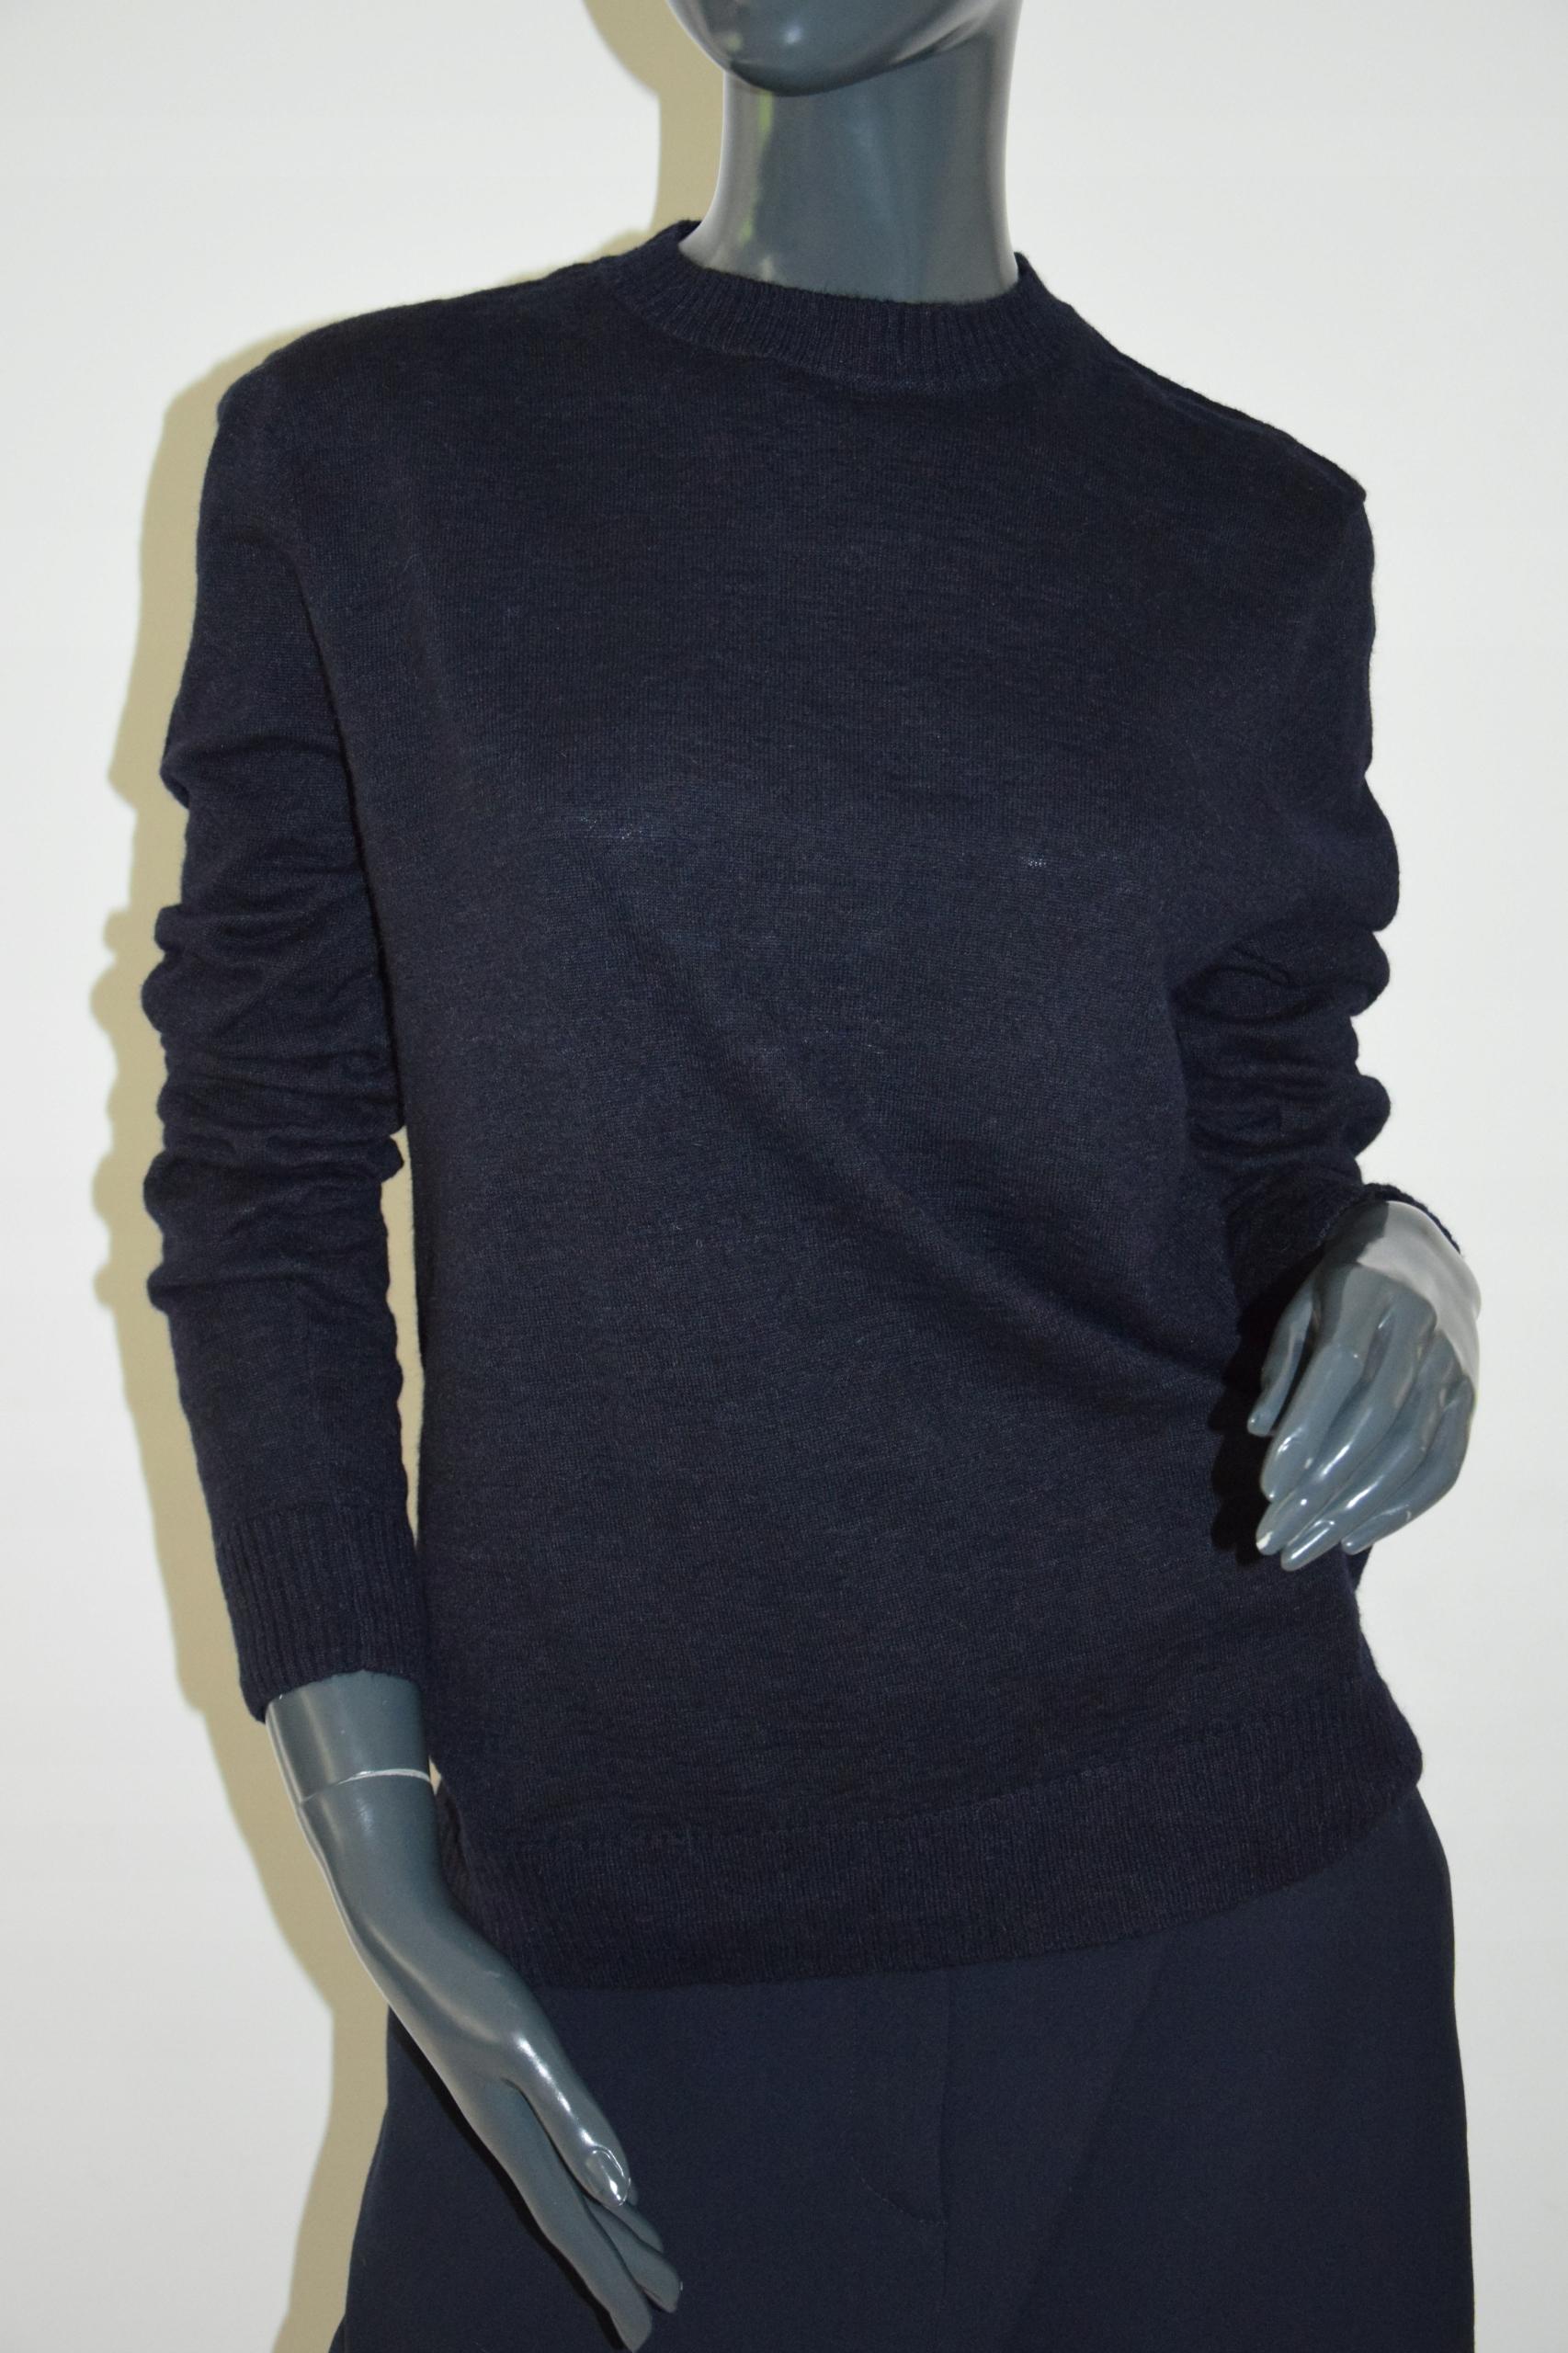 cos granatowy sweter alpaka r. M/38